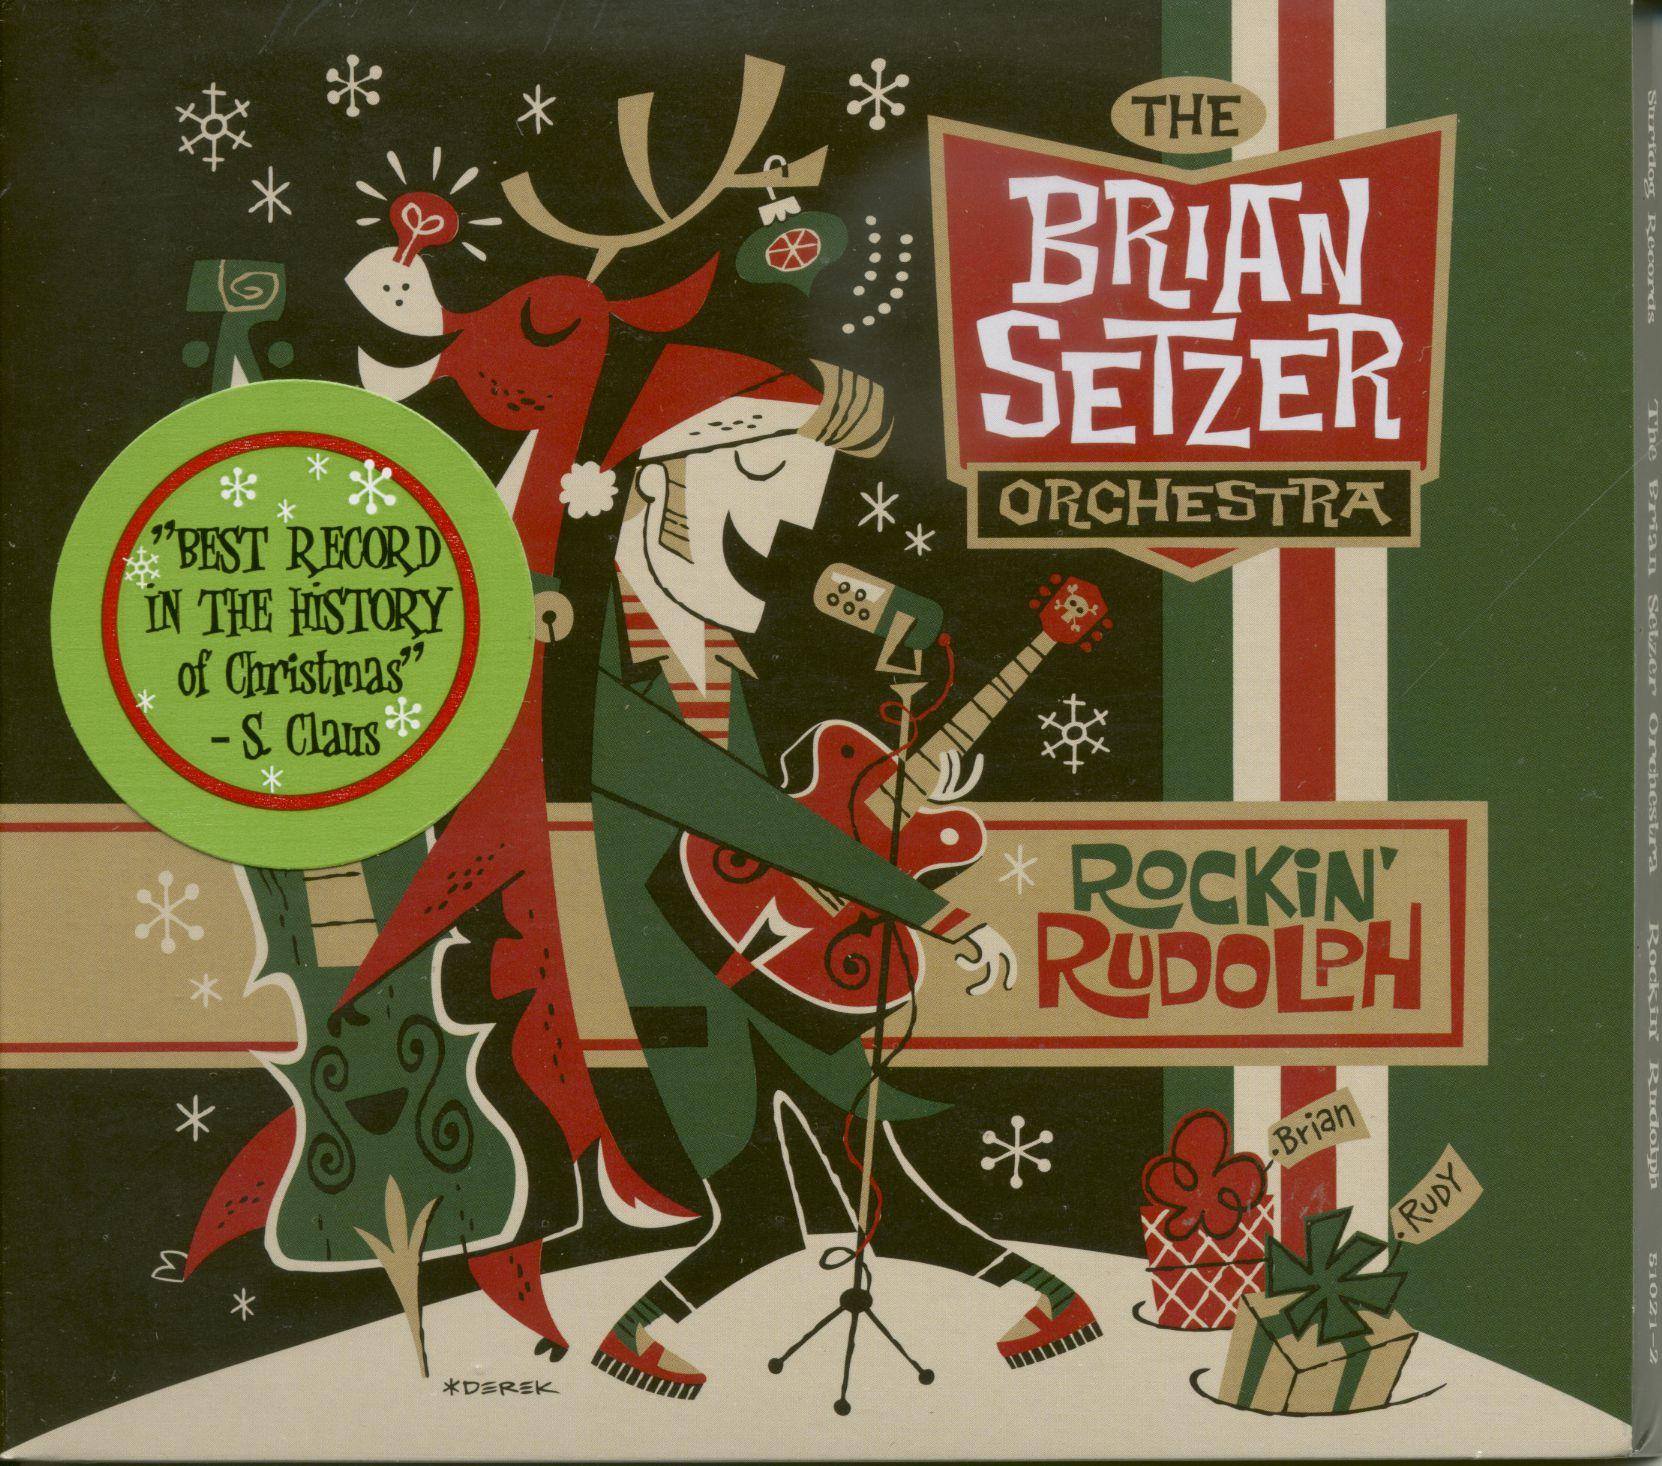 Brian Setzer Orchestra CD: Rockin\' Rudolph - Bear Family Records